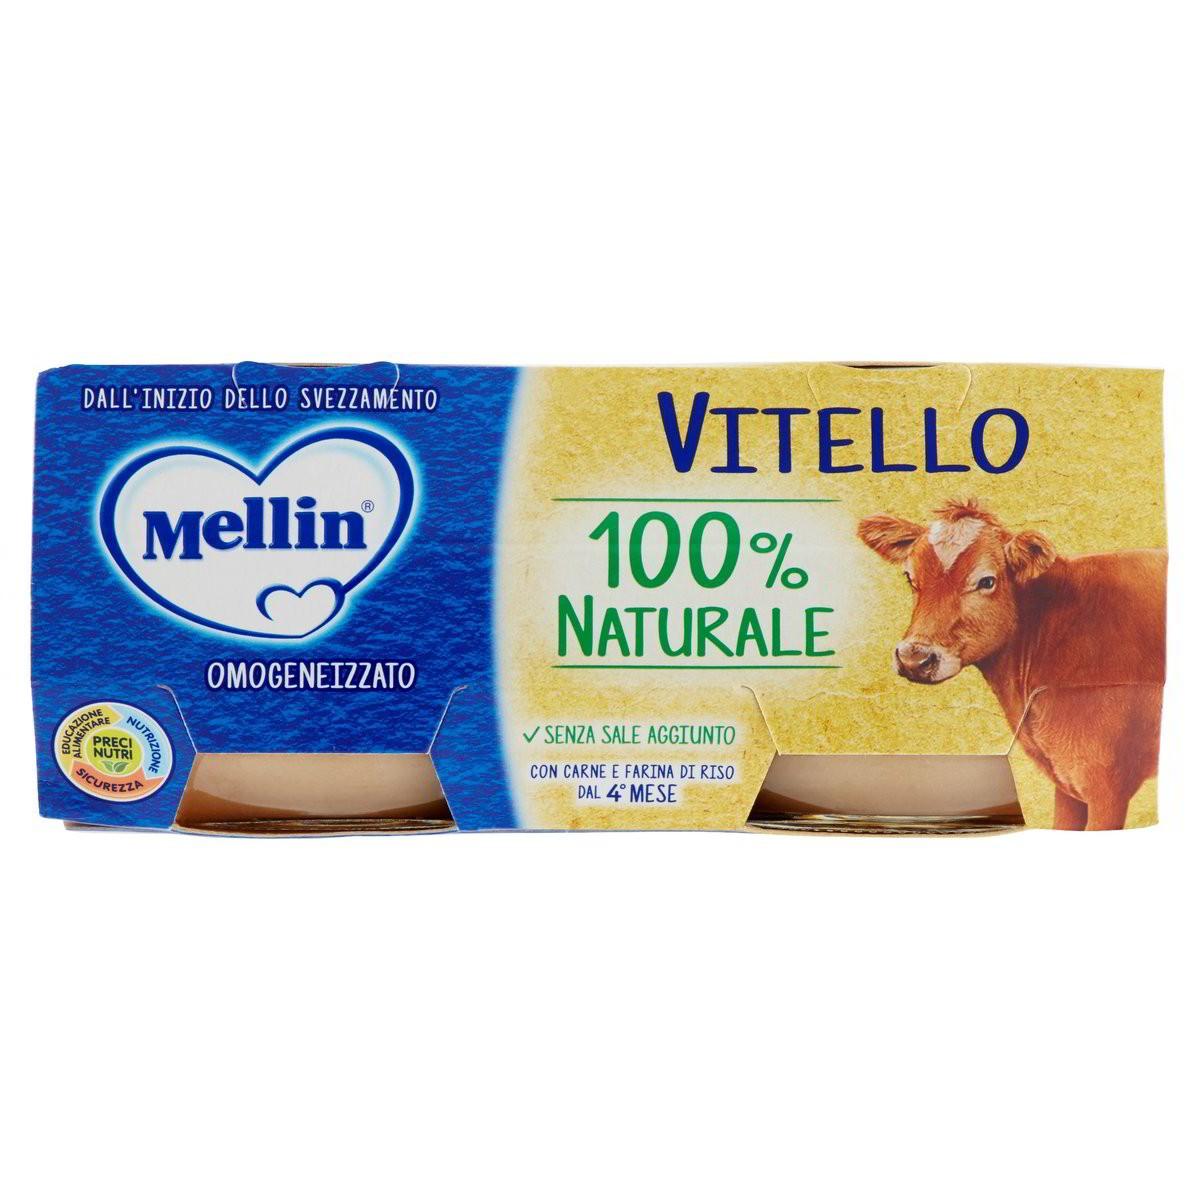 Mellin Omogeneizzato Vitello